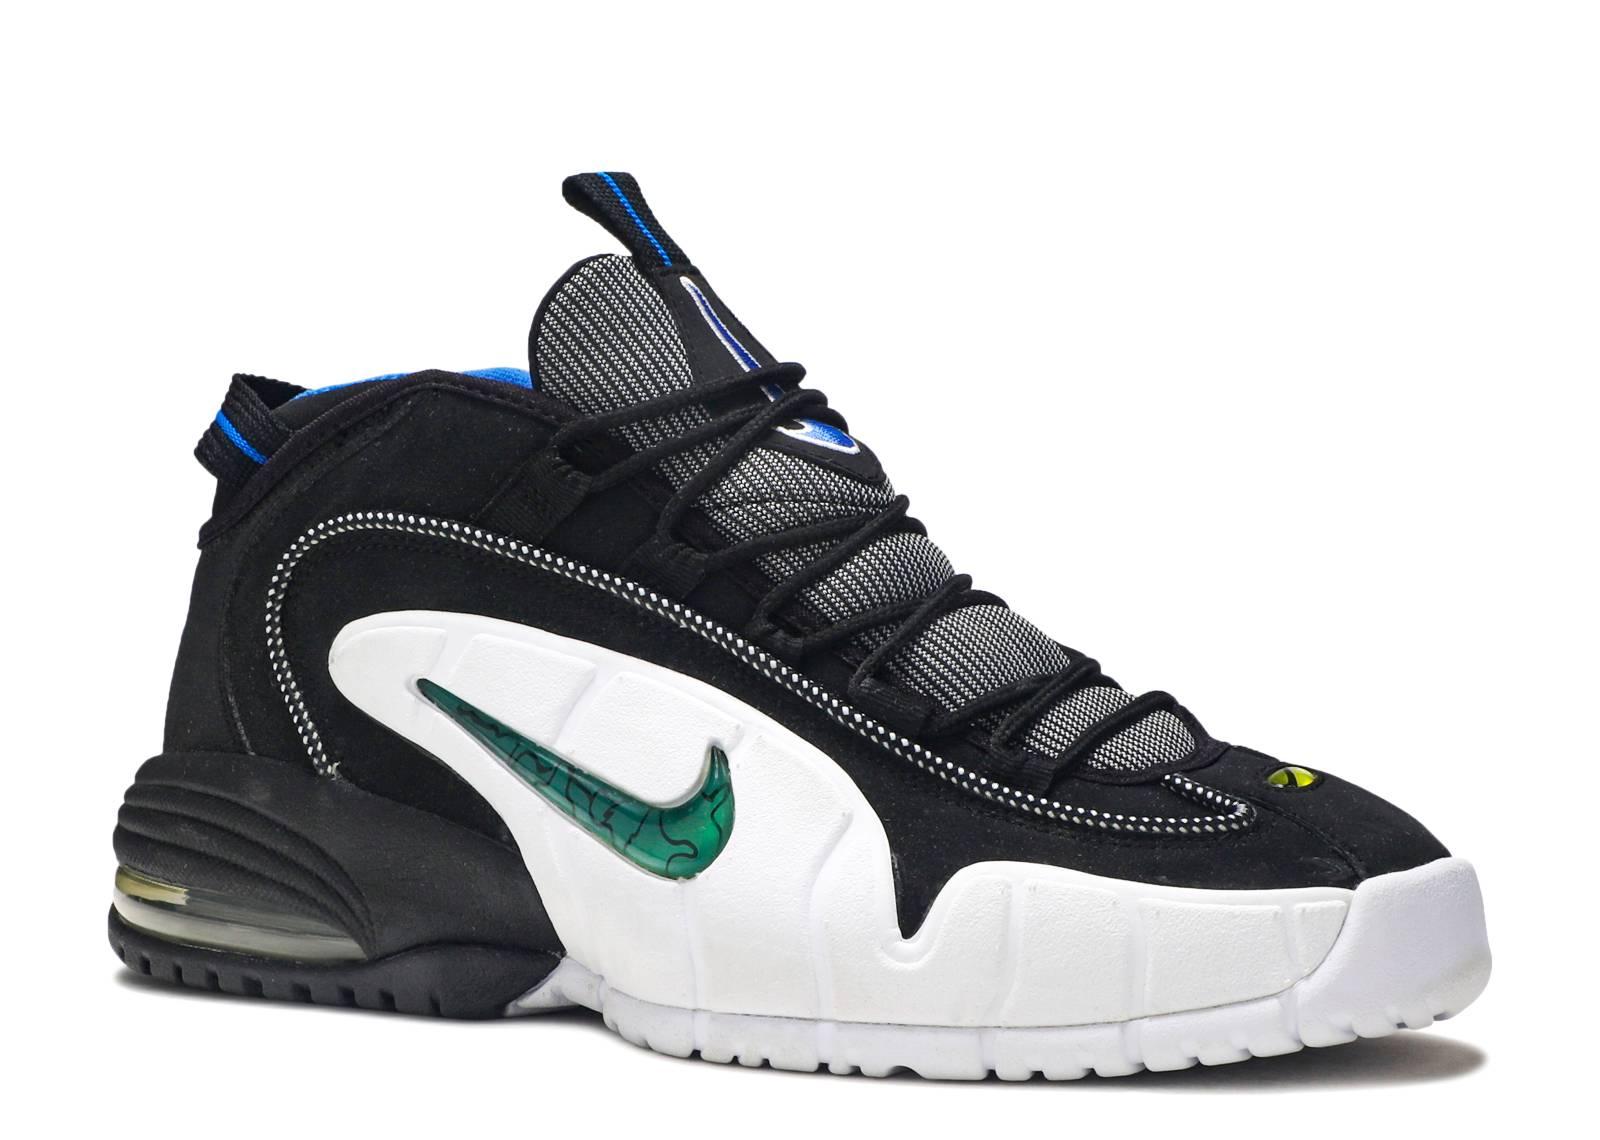 Air Max Penny 1 'Orlando' - Nike - 311089 001 - black/varsity ...